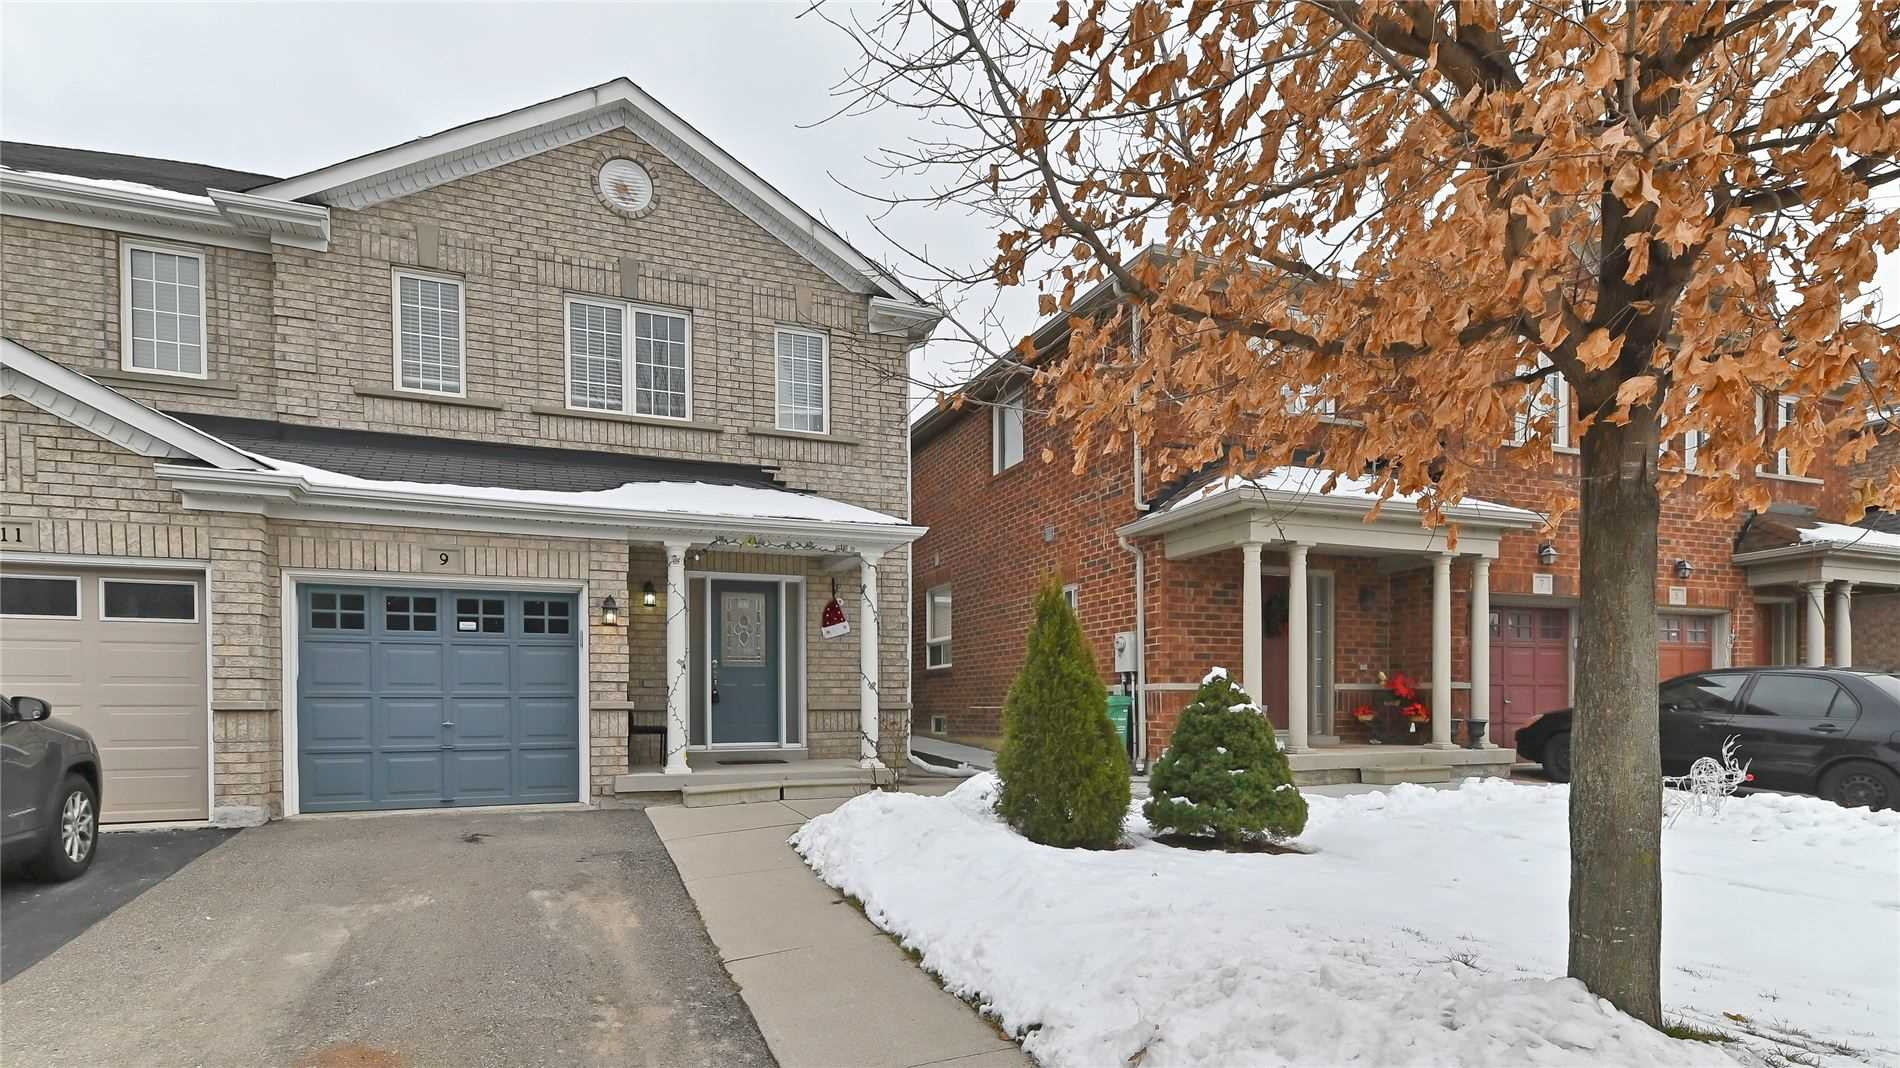 9 Silverbell Crt, Brampton, Ontario L7A 3V3, 3 Bedrooms Bedrooms, ,3 BathroomsBathrooms,Semi-Detached,For Sale,Silverbell,W5081621